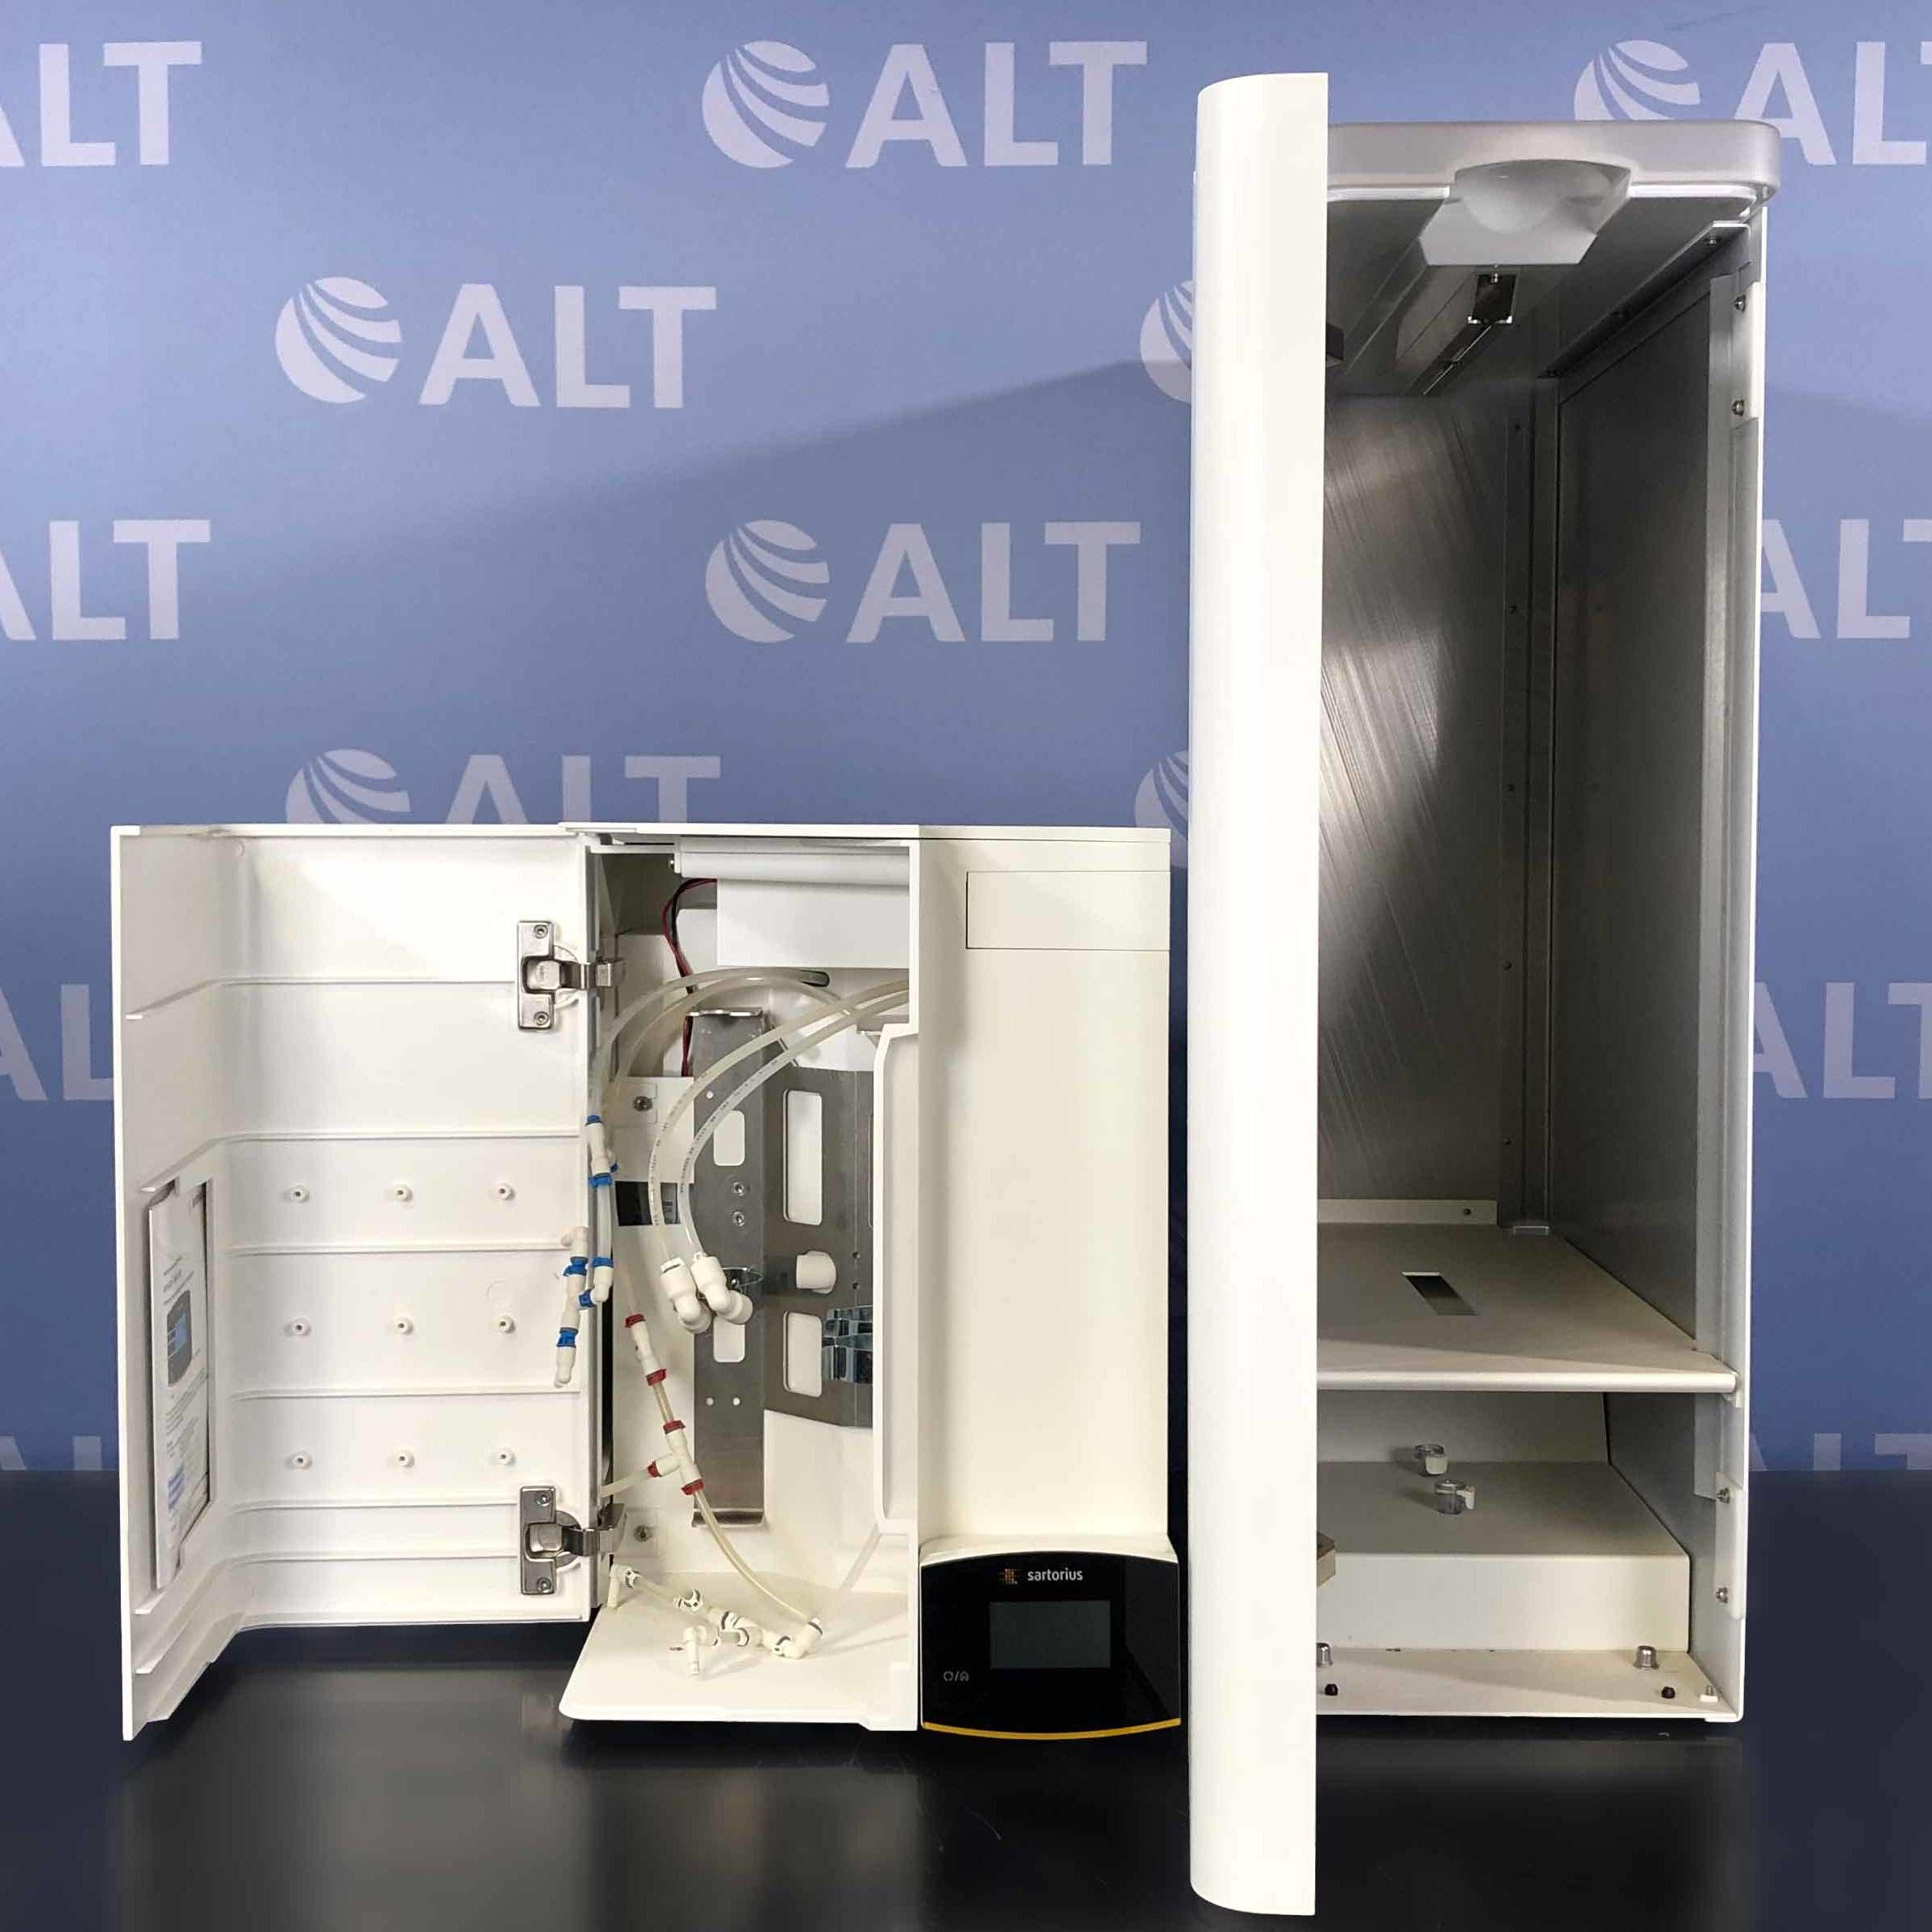 Sartorius H2O-RO-3-B Arium Advance RO Type 3 Reverse Osmosis Water System with H2O-AOV-50-US Arium Bagtank 50 Image